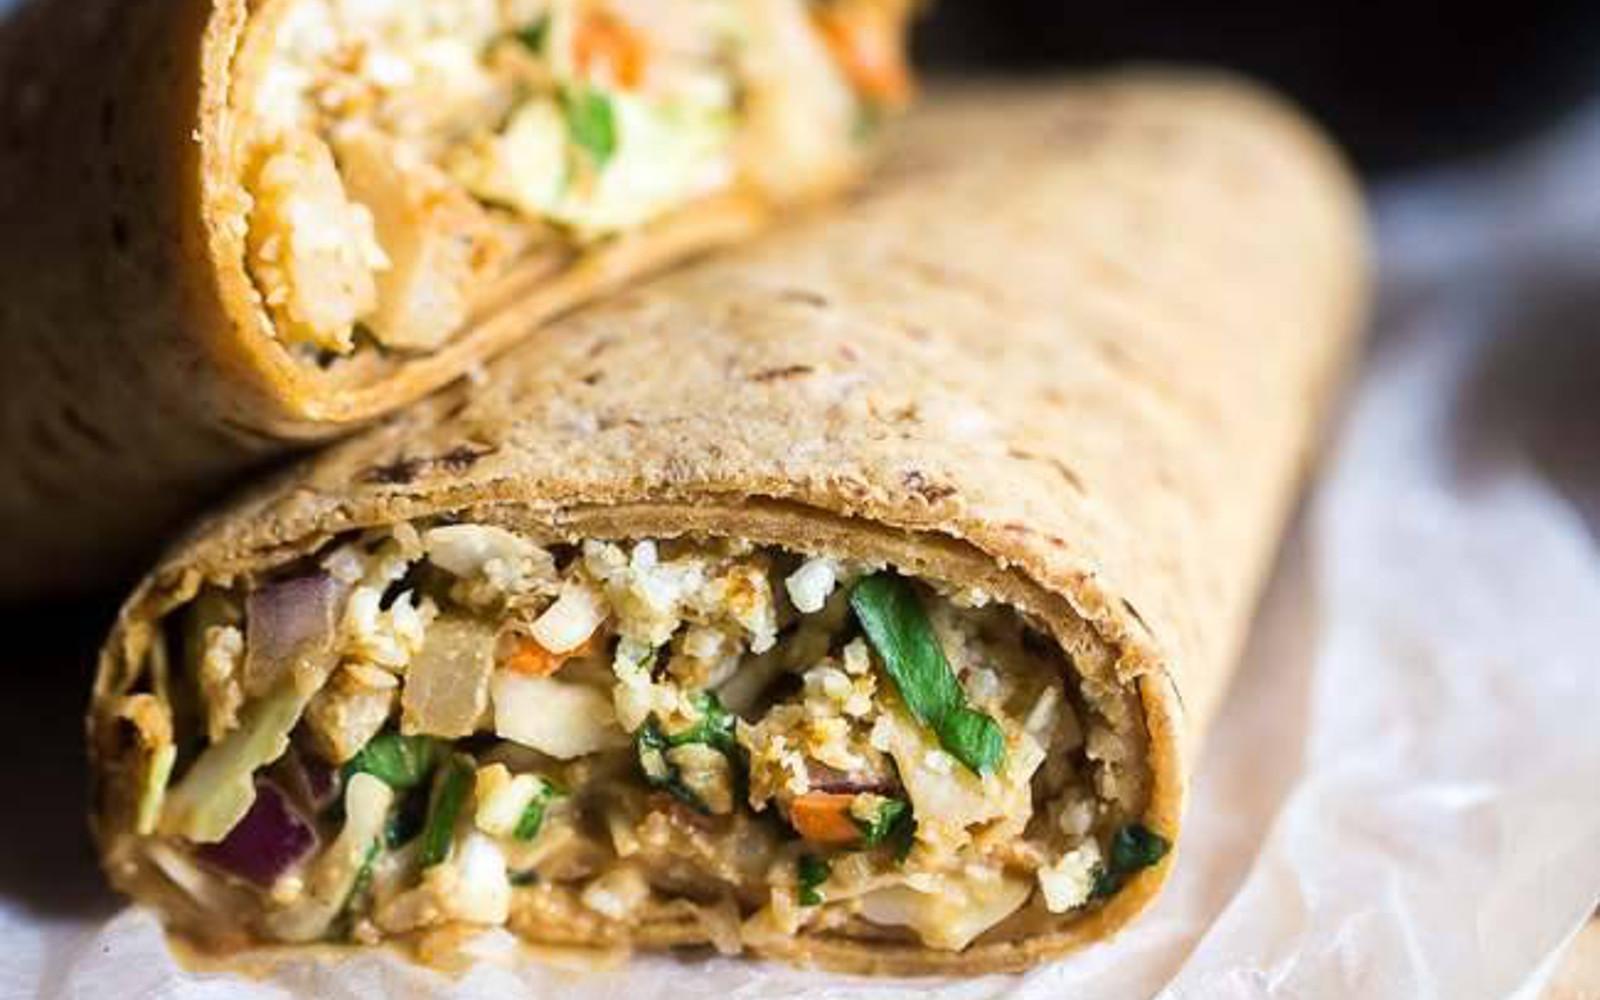 Thai Salad and Cauliflower Rice Wrap 2